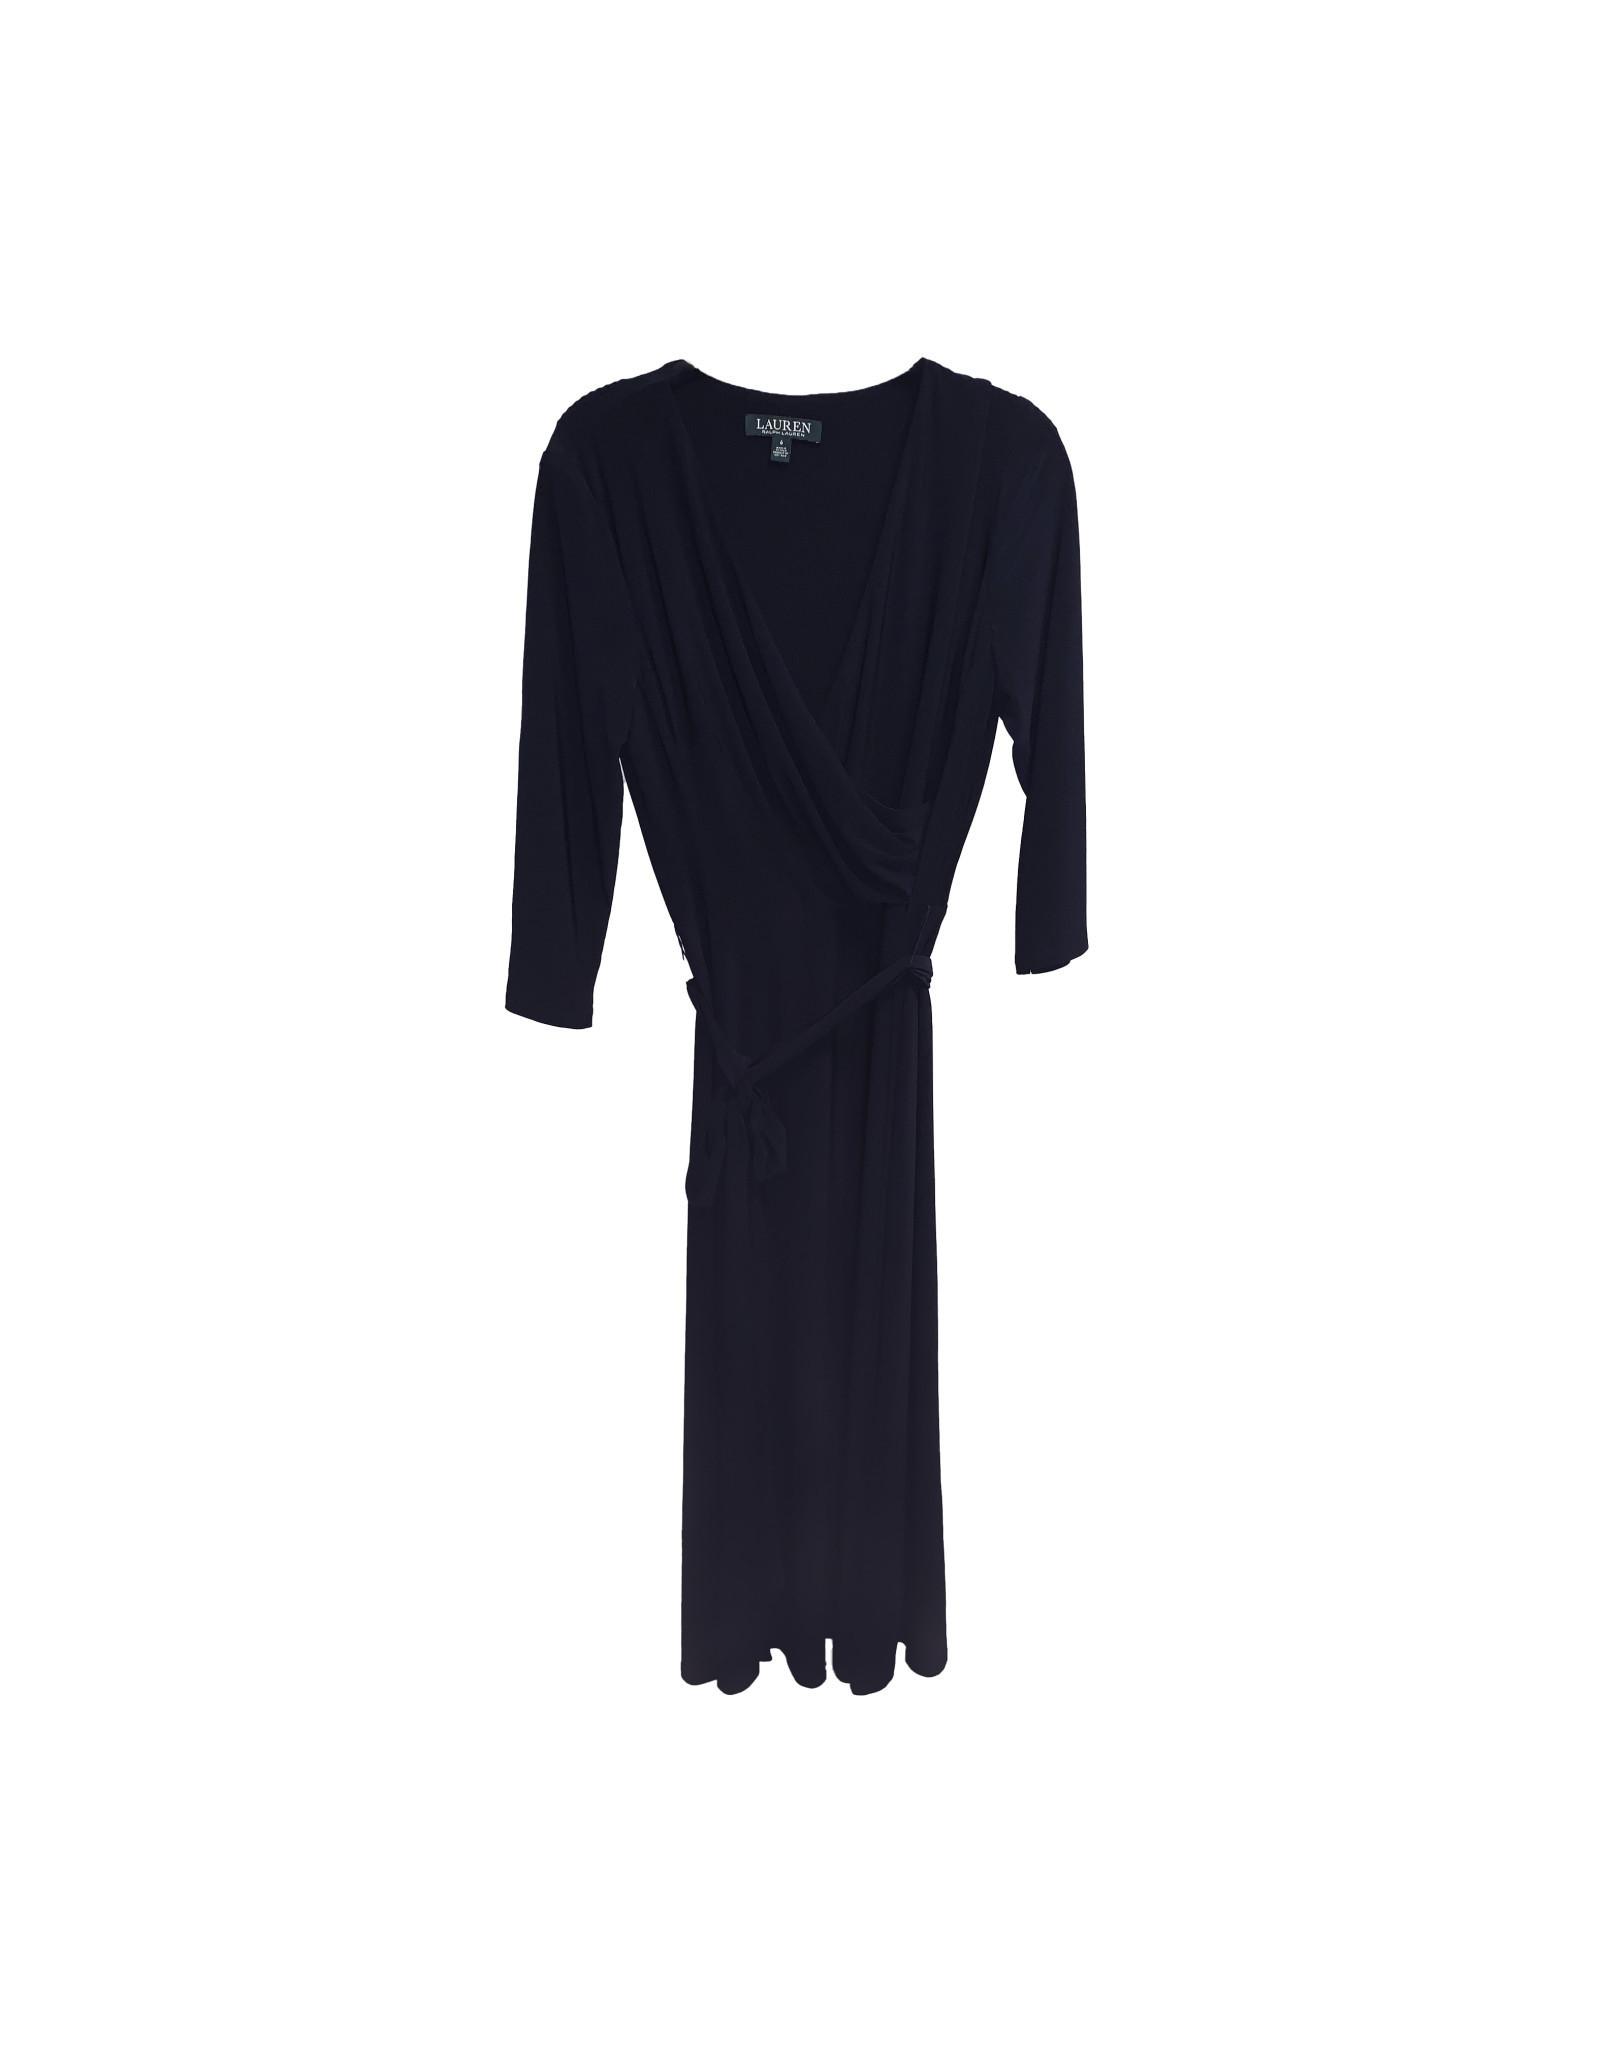 LAUREN RALPH LAUREN Lauren Ralph Lauren Stretch Jersey Wrap Dress